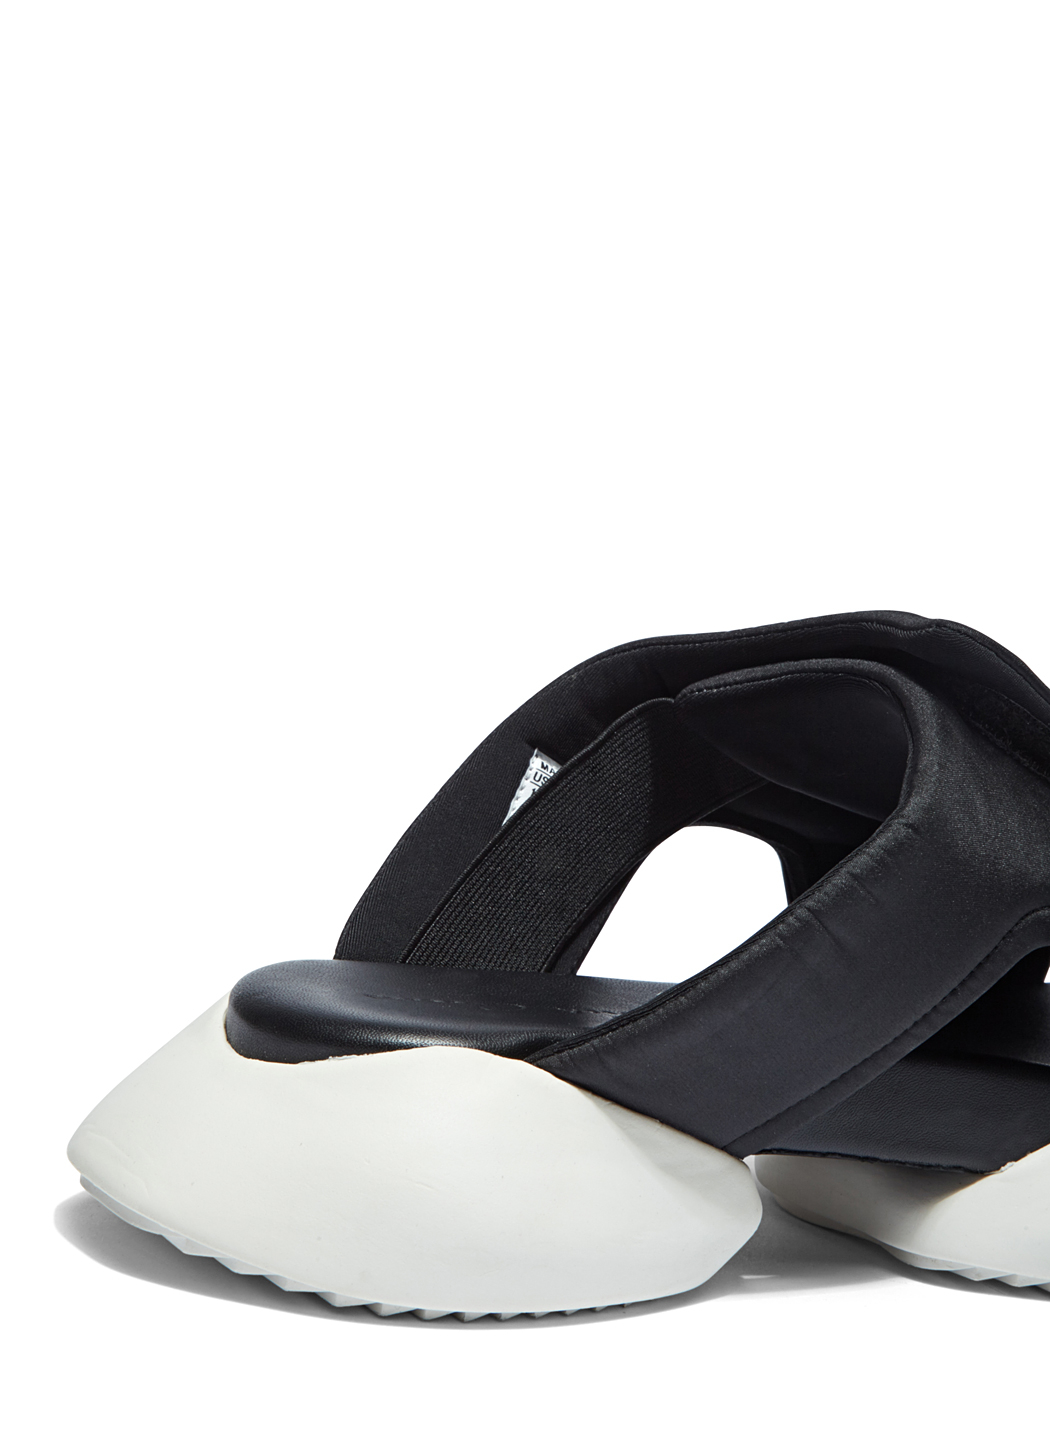 Lyst Rick Owens X Adidas Men S Velcro Strap Ro Clog